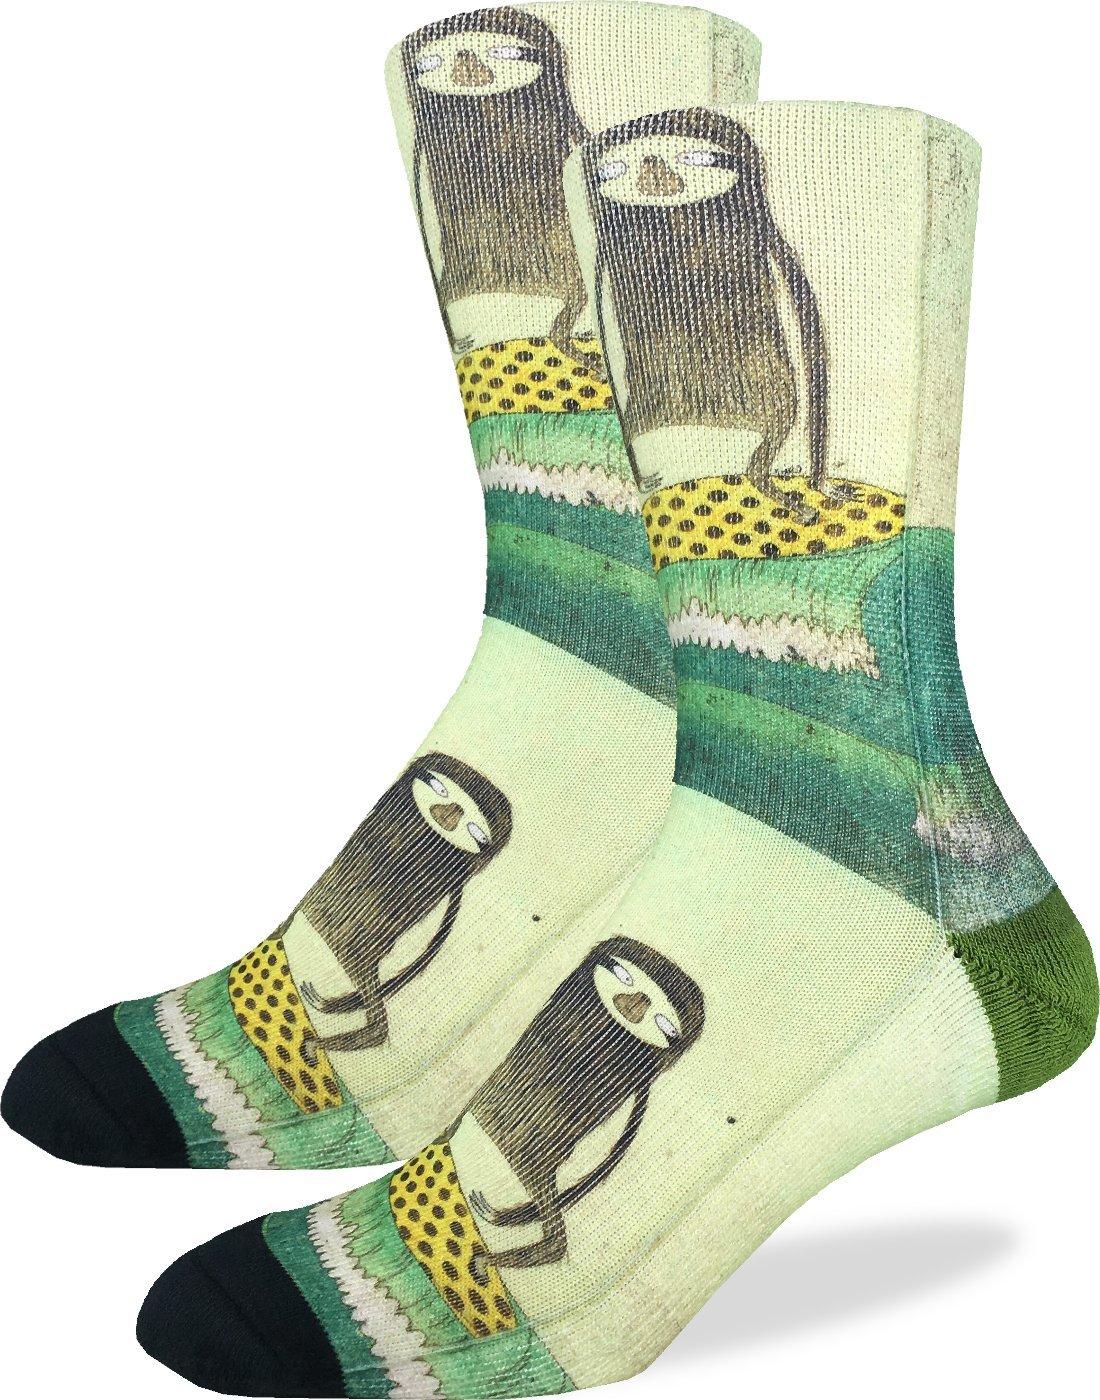 Good Luck Sock Men'S Surfing Sloth Crew Socks - Green, Adult Shoe Size 8-13 -